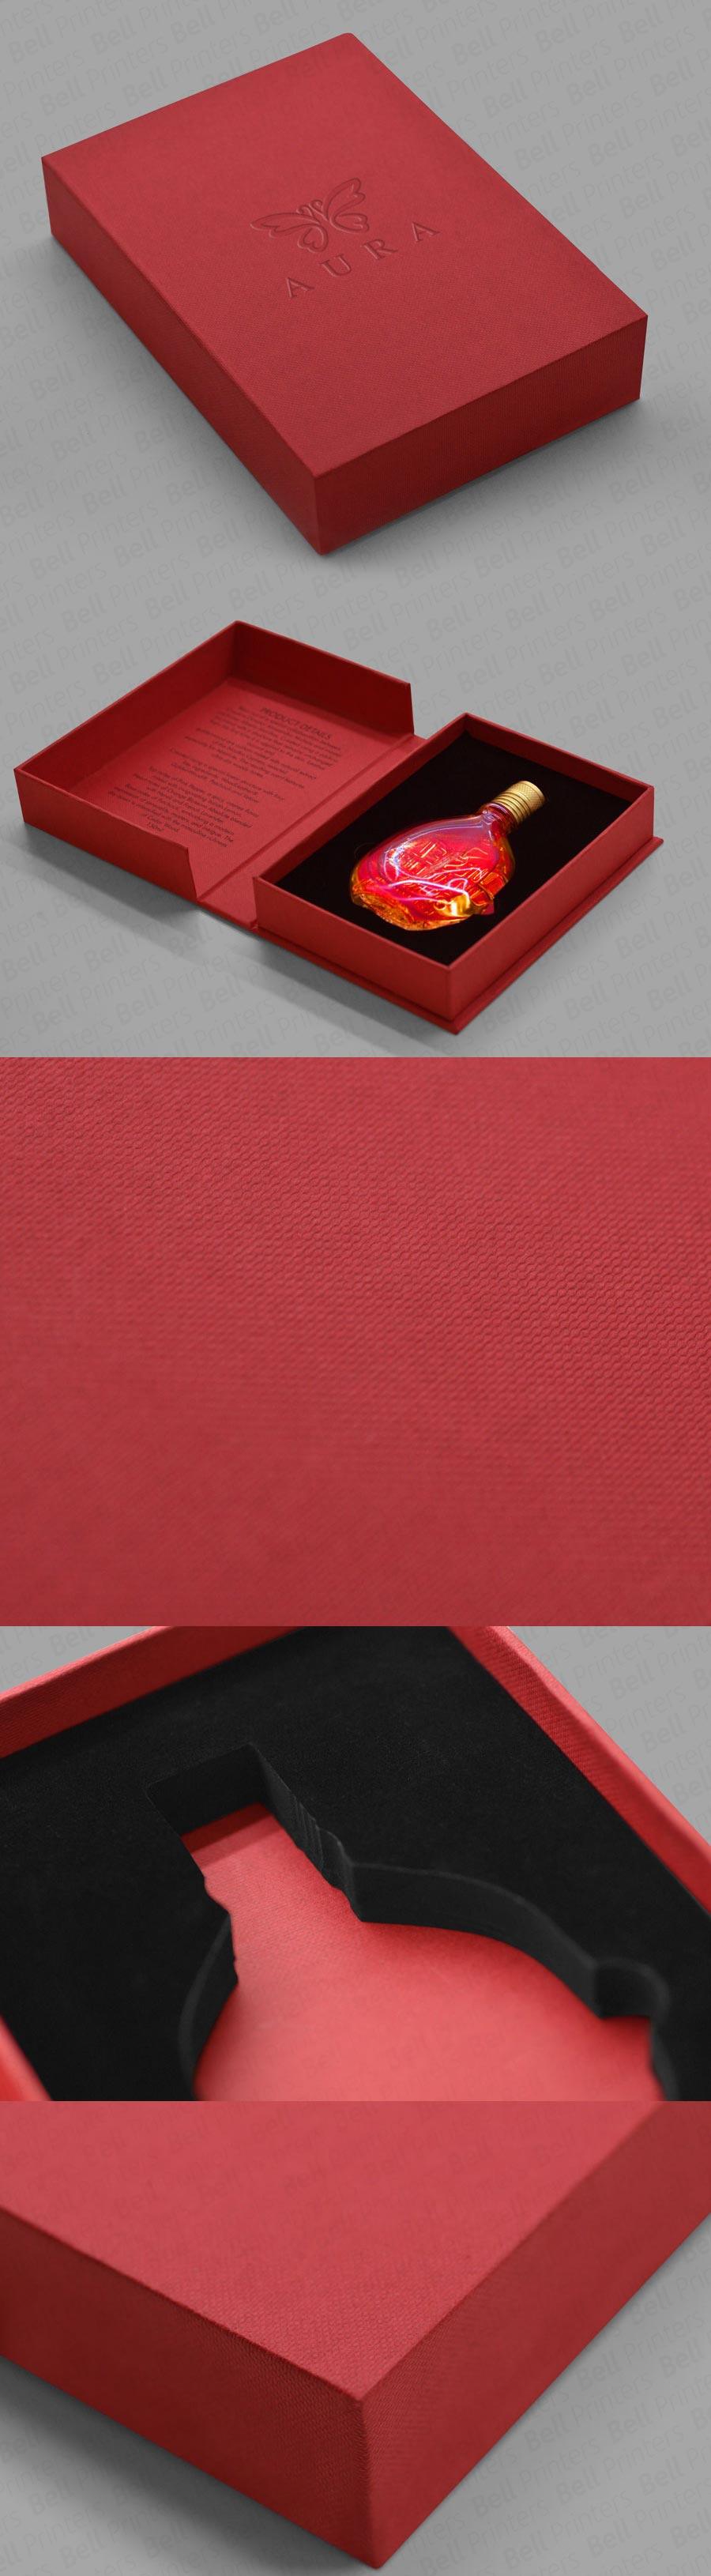 Luxury perfume boxes packaging | Premium Scent Box